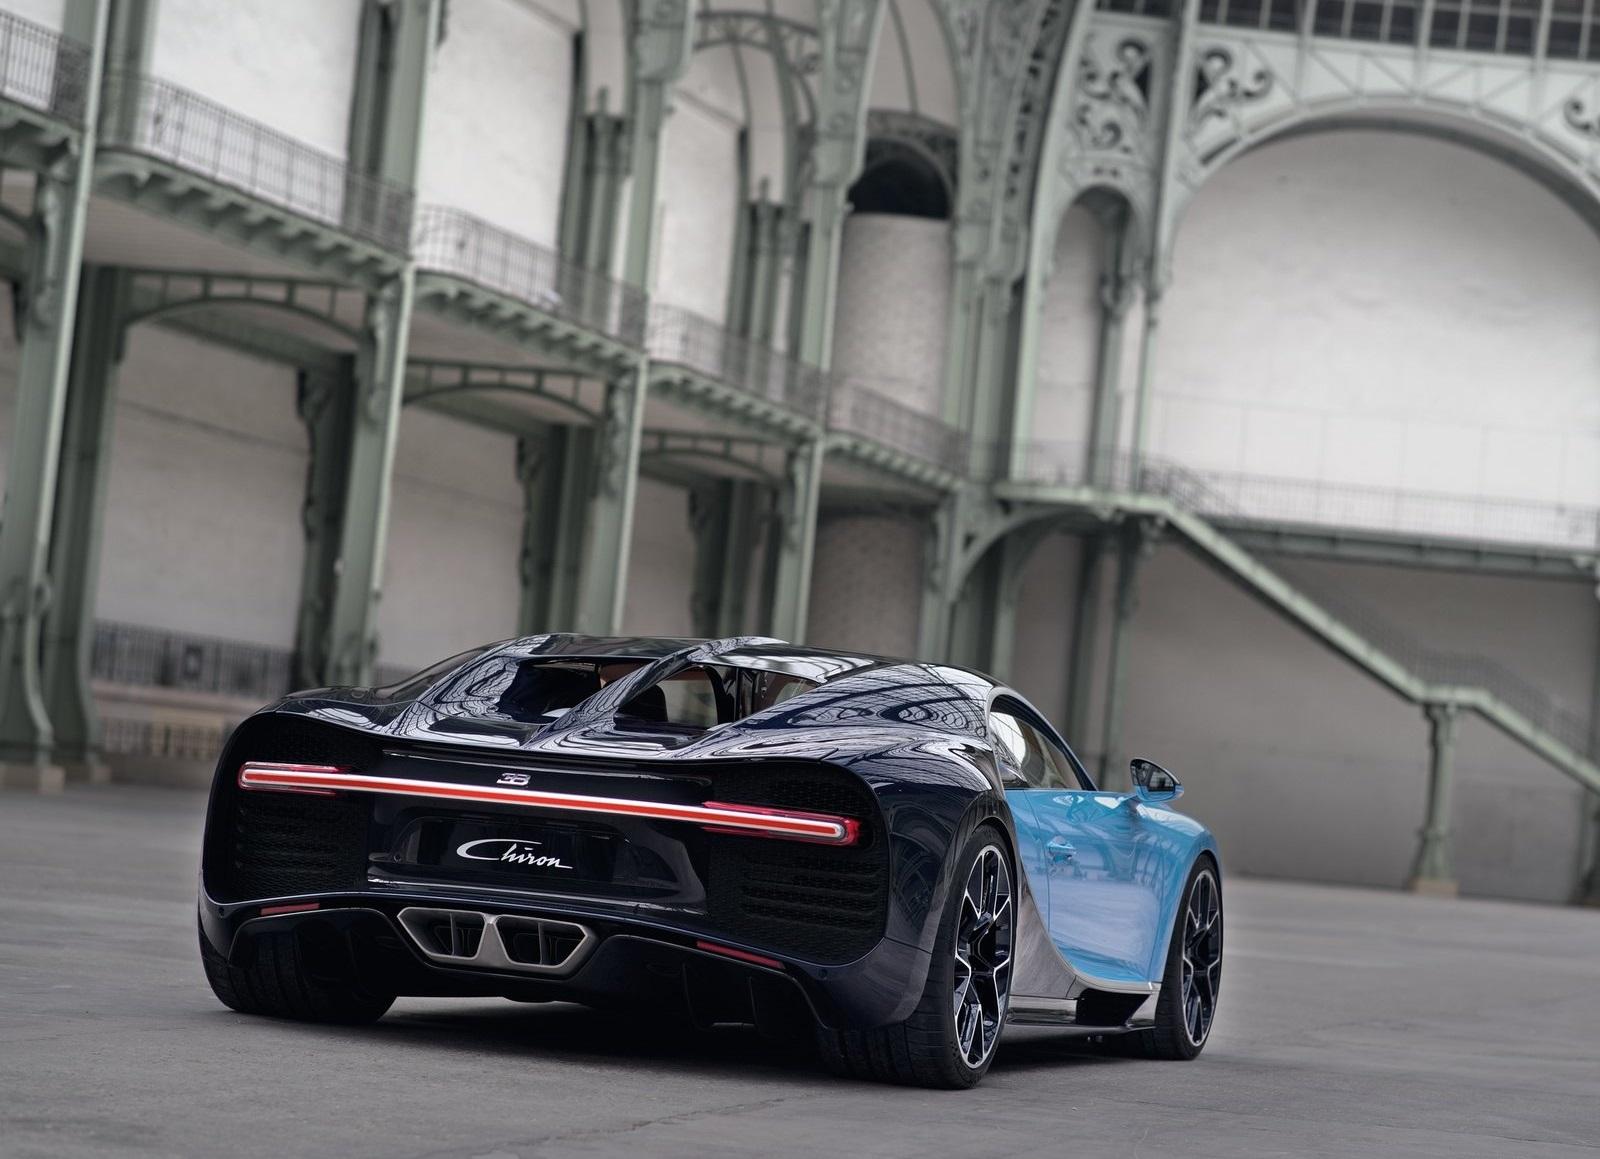 Bugatti Chiron_proceso de compra_tres cuartos trasera